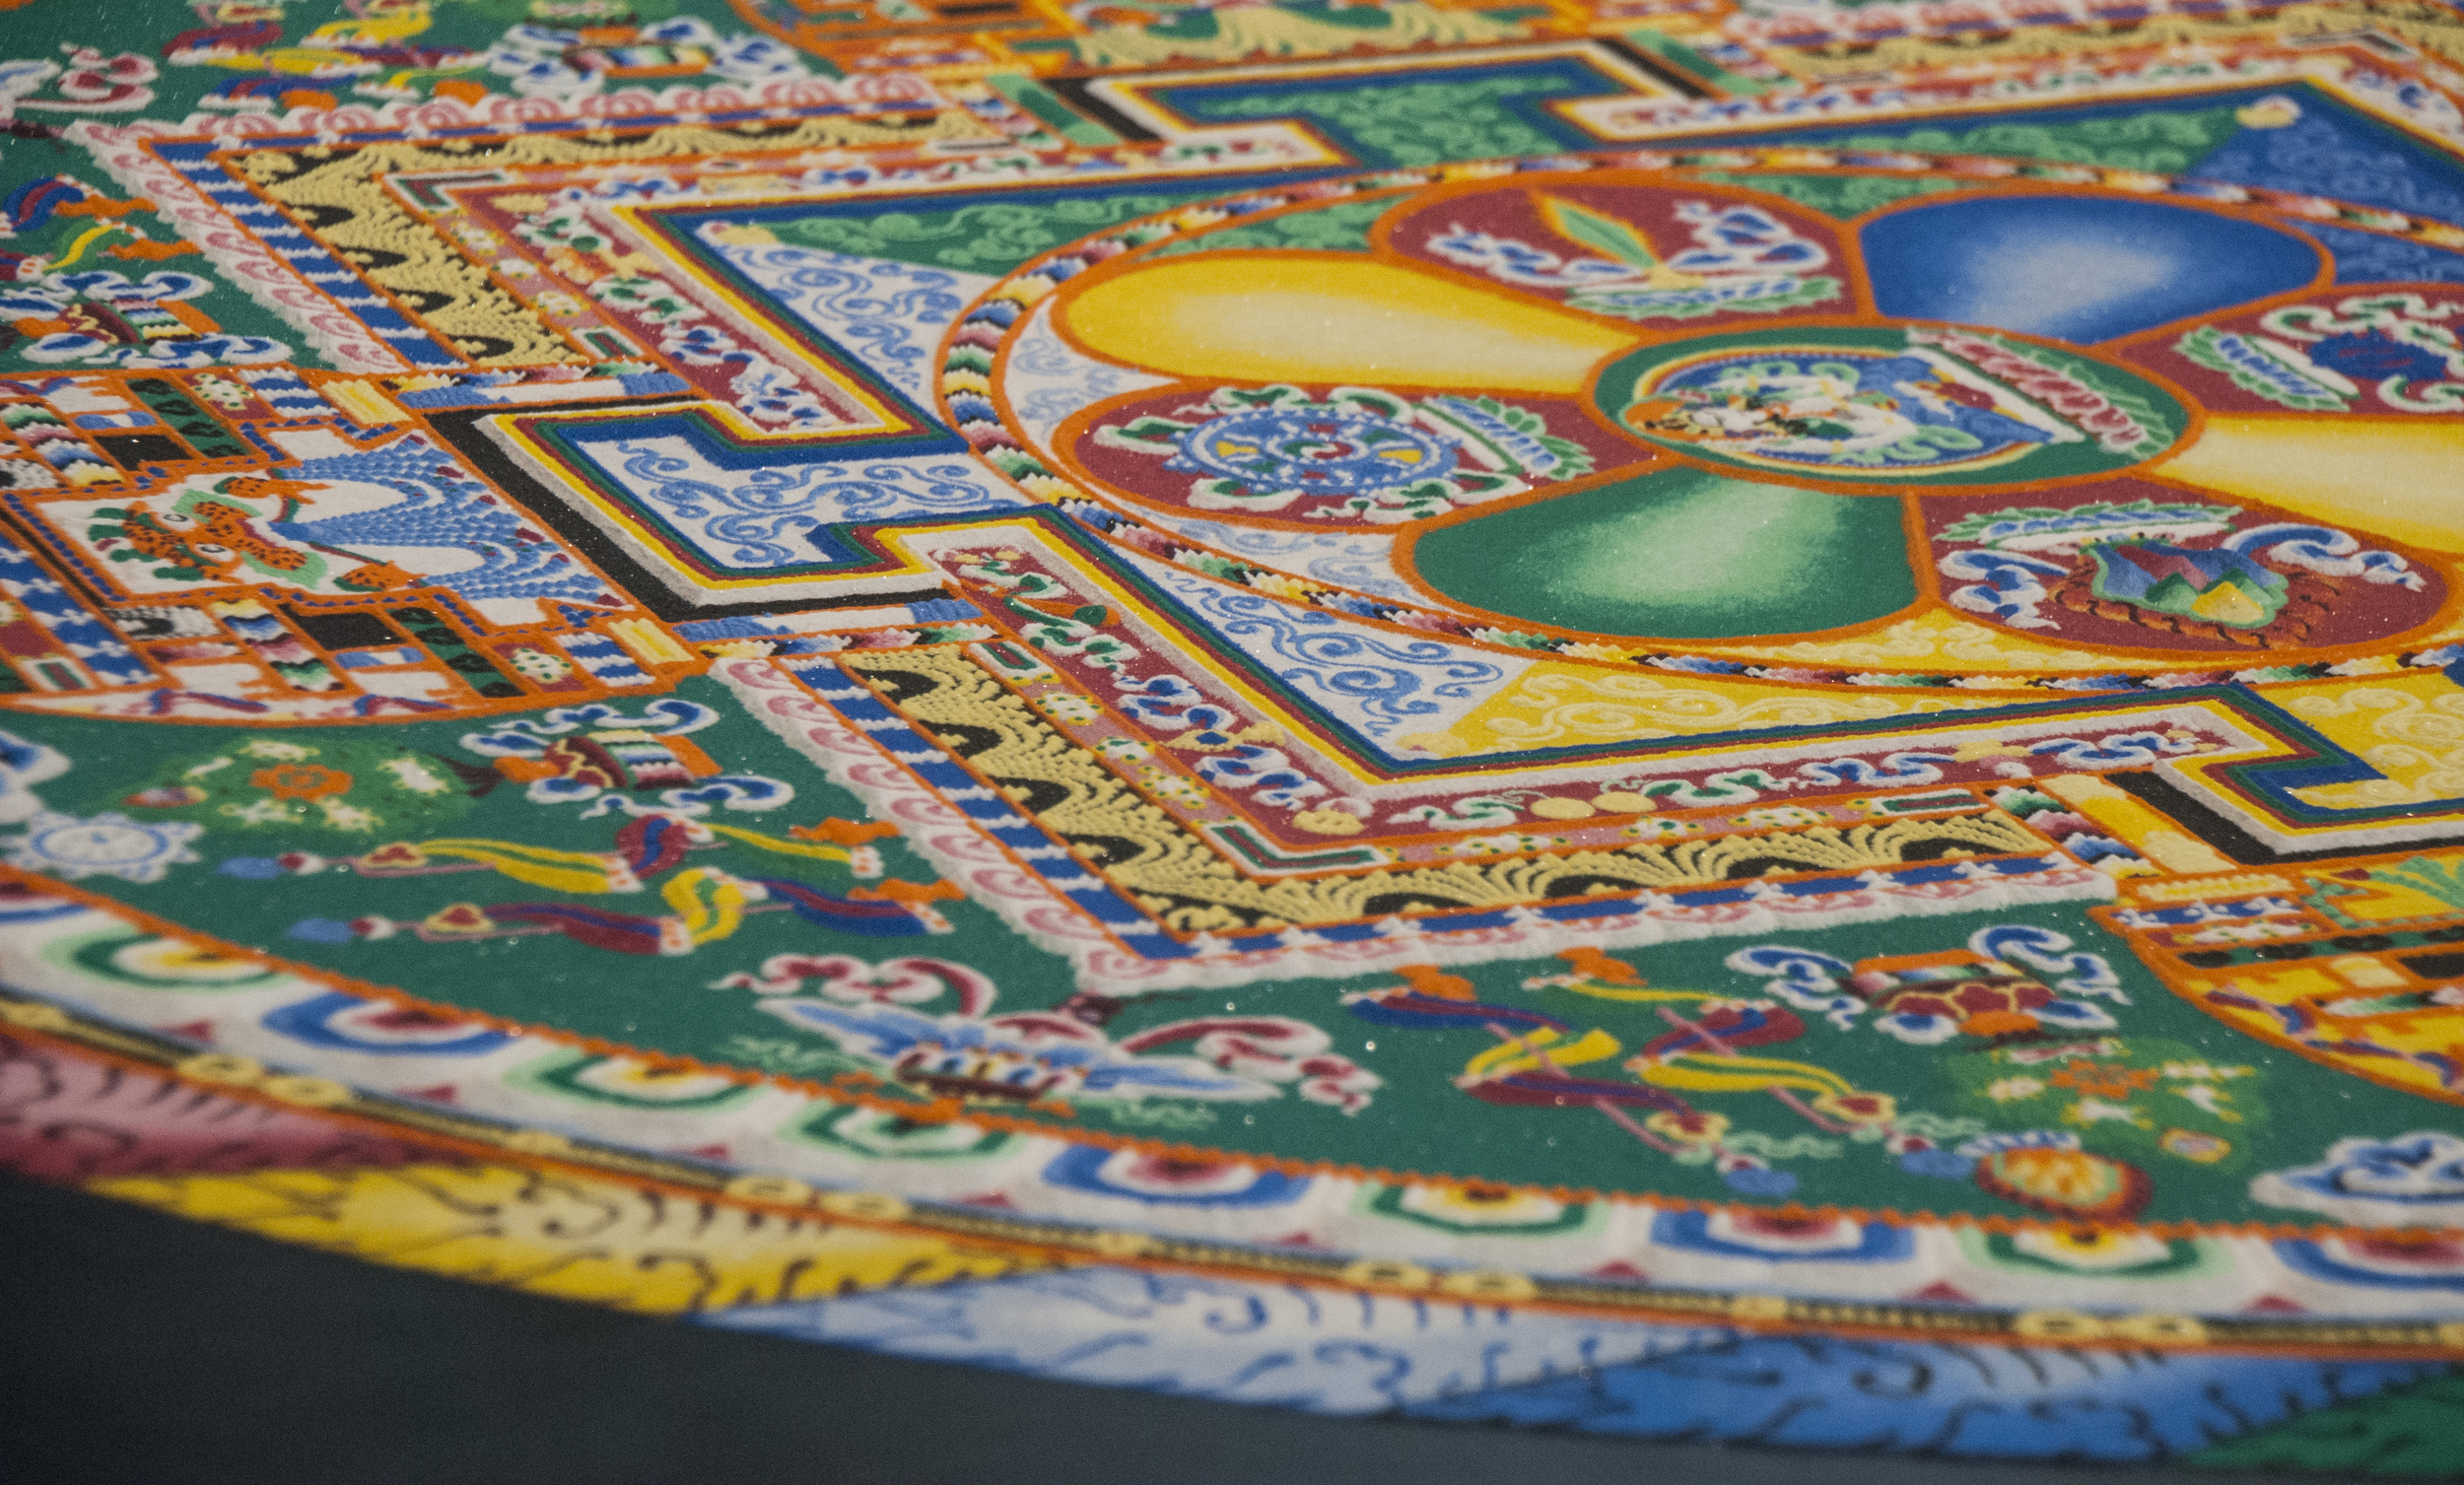 The Sand Mandala before its deconstruction